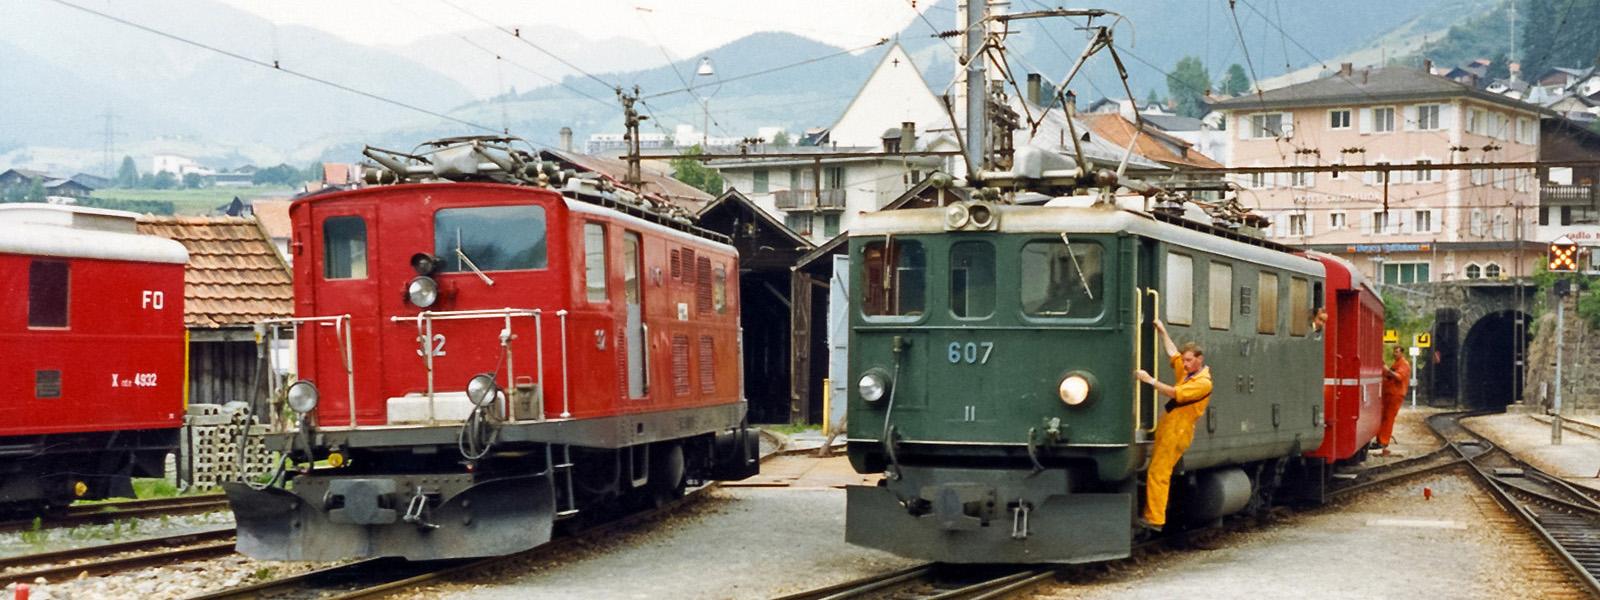 Furka-Oberalp-Bahn FO, Rhätische Bahn RhB